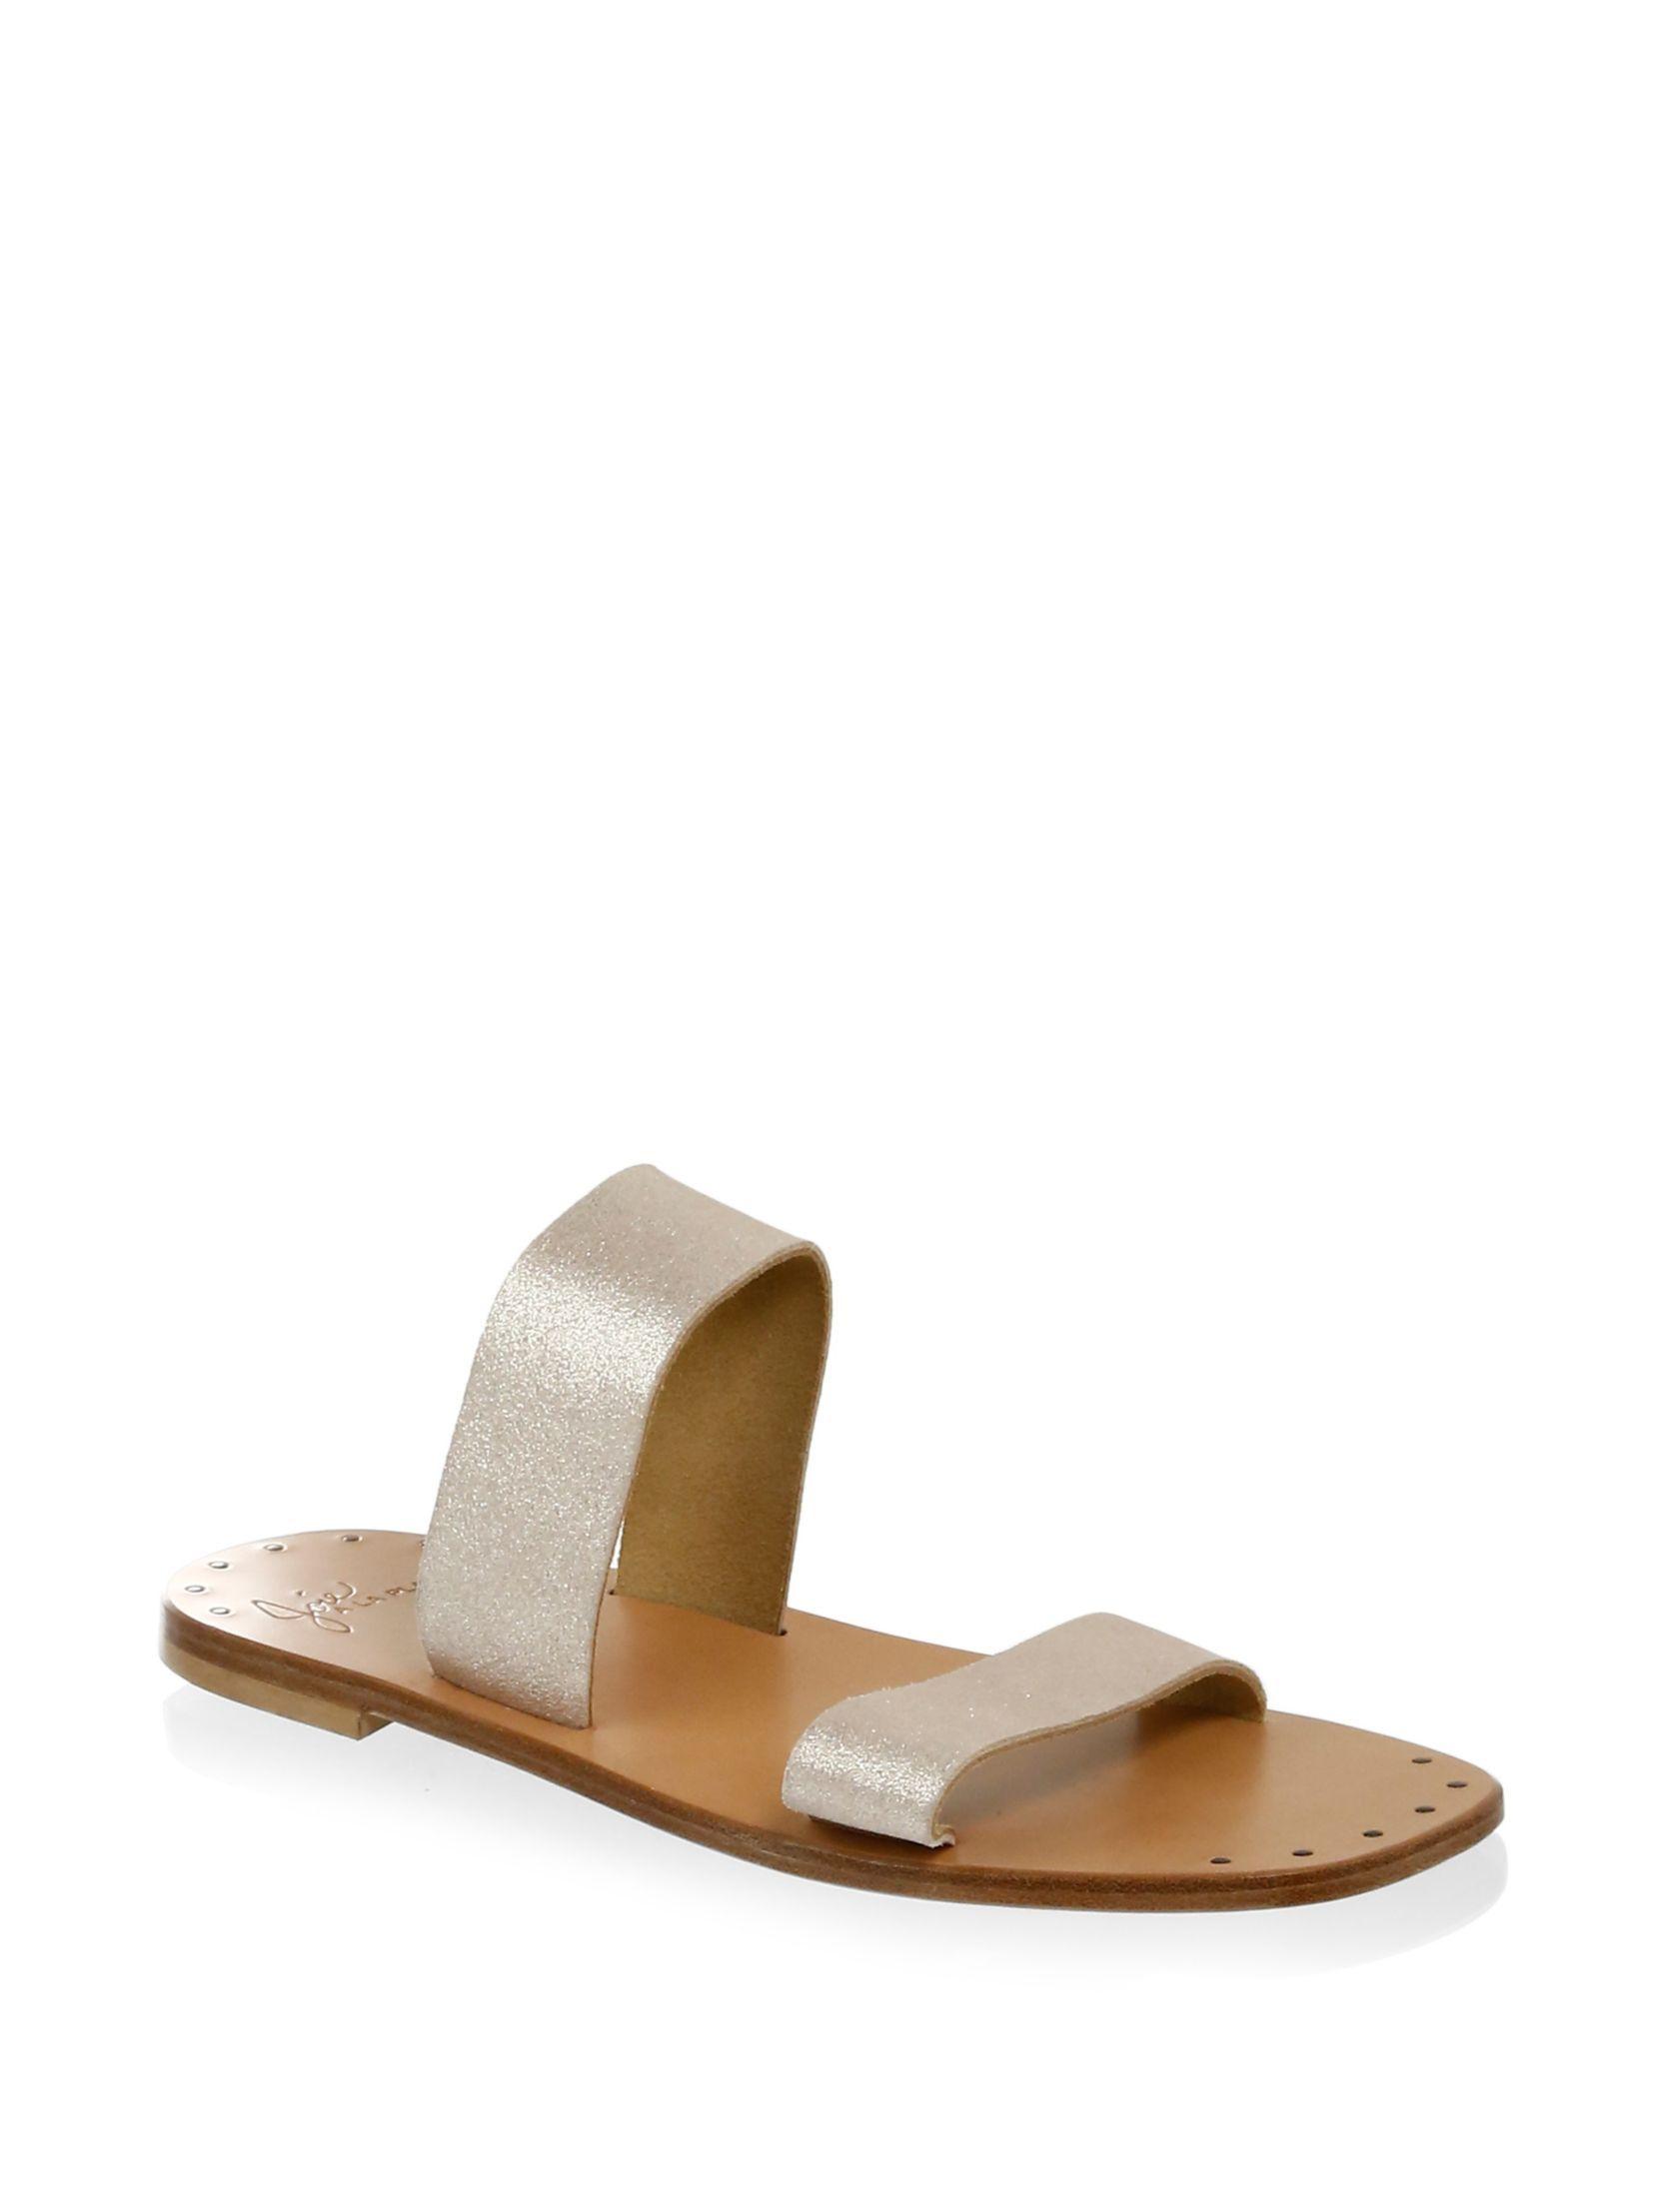 Joie Bannerly Metallic Leather Sandals I3rZCAA